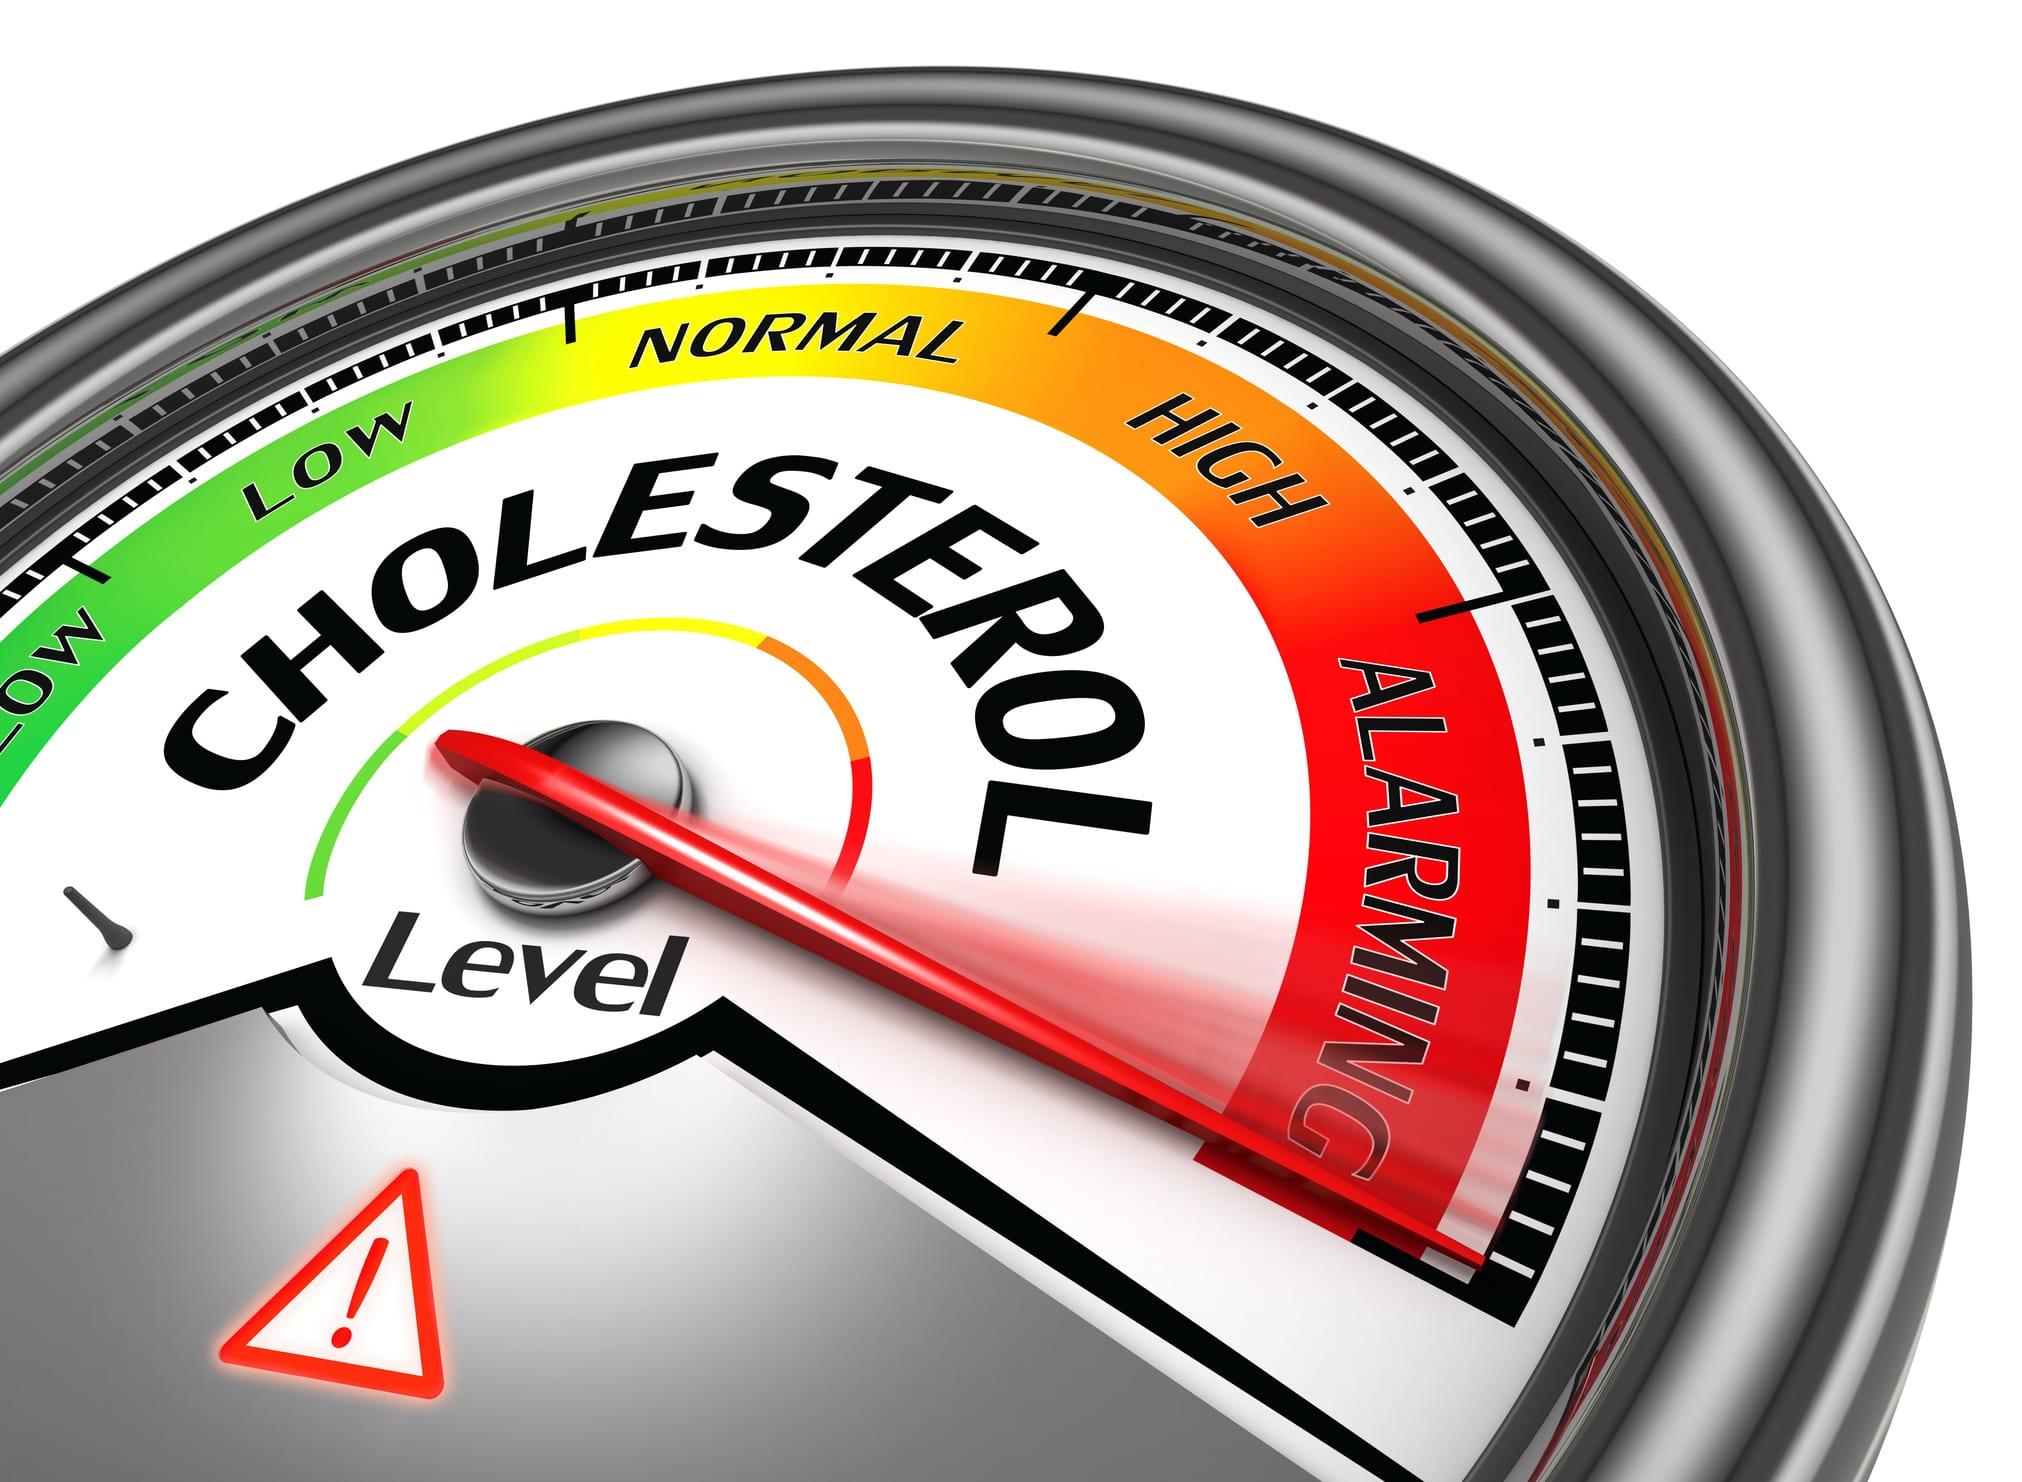 Testing cholesterol